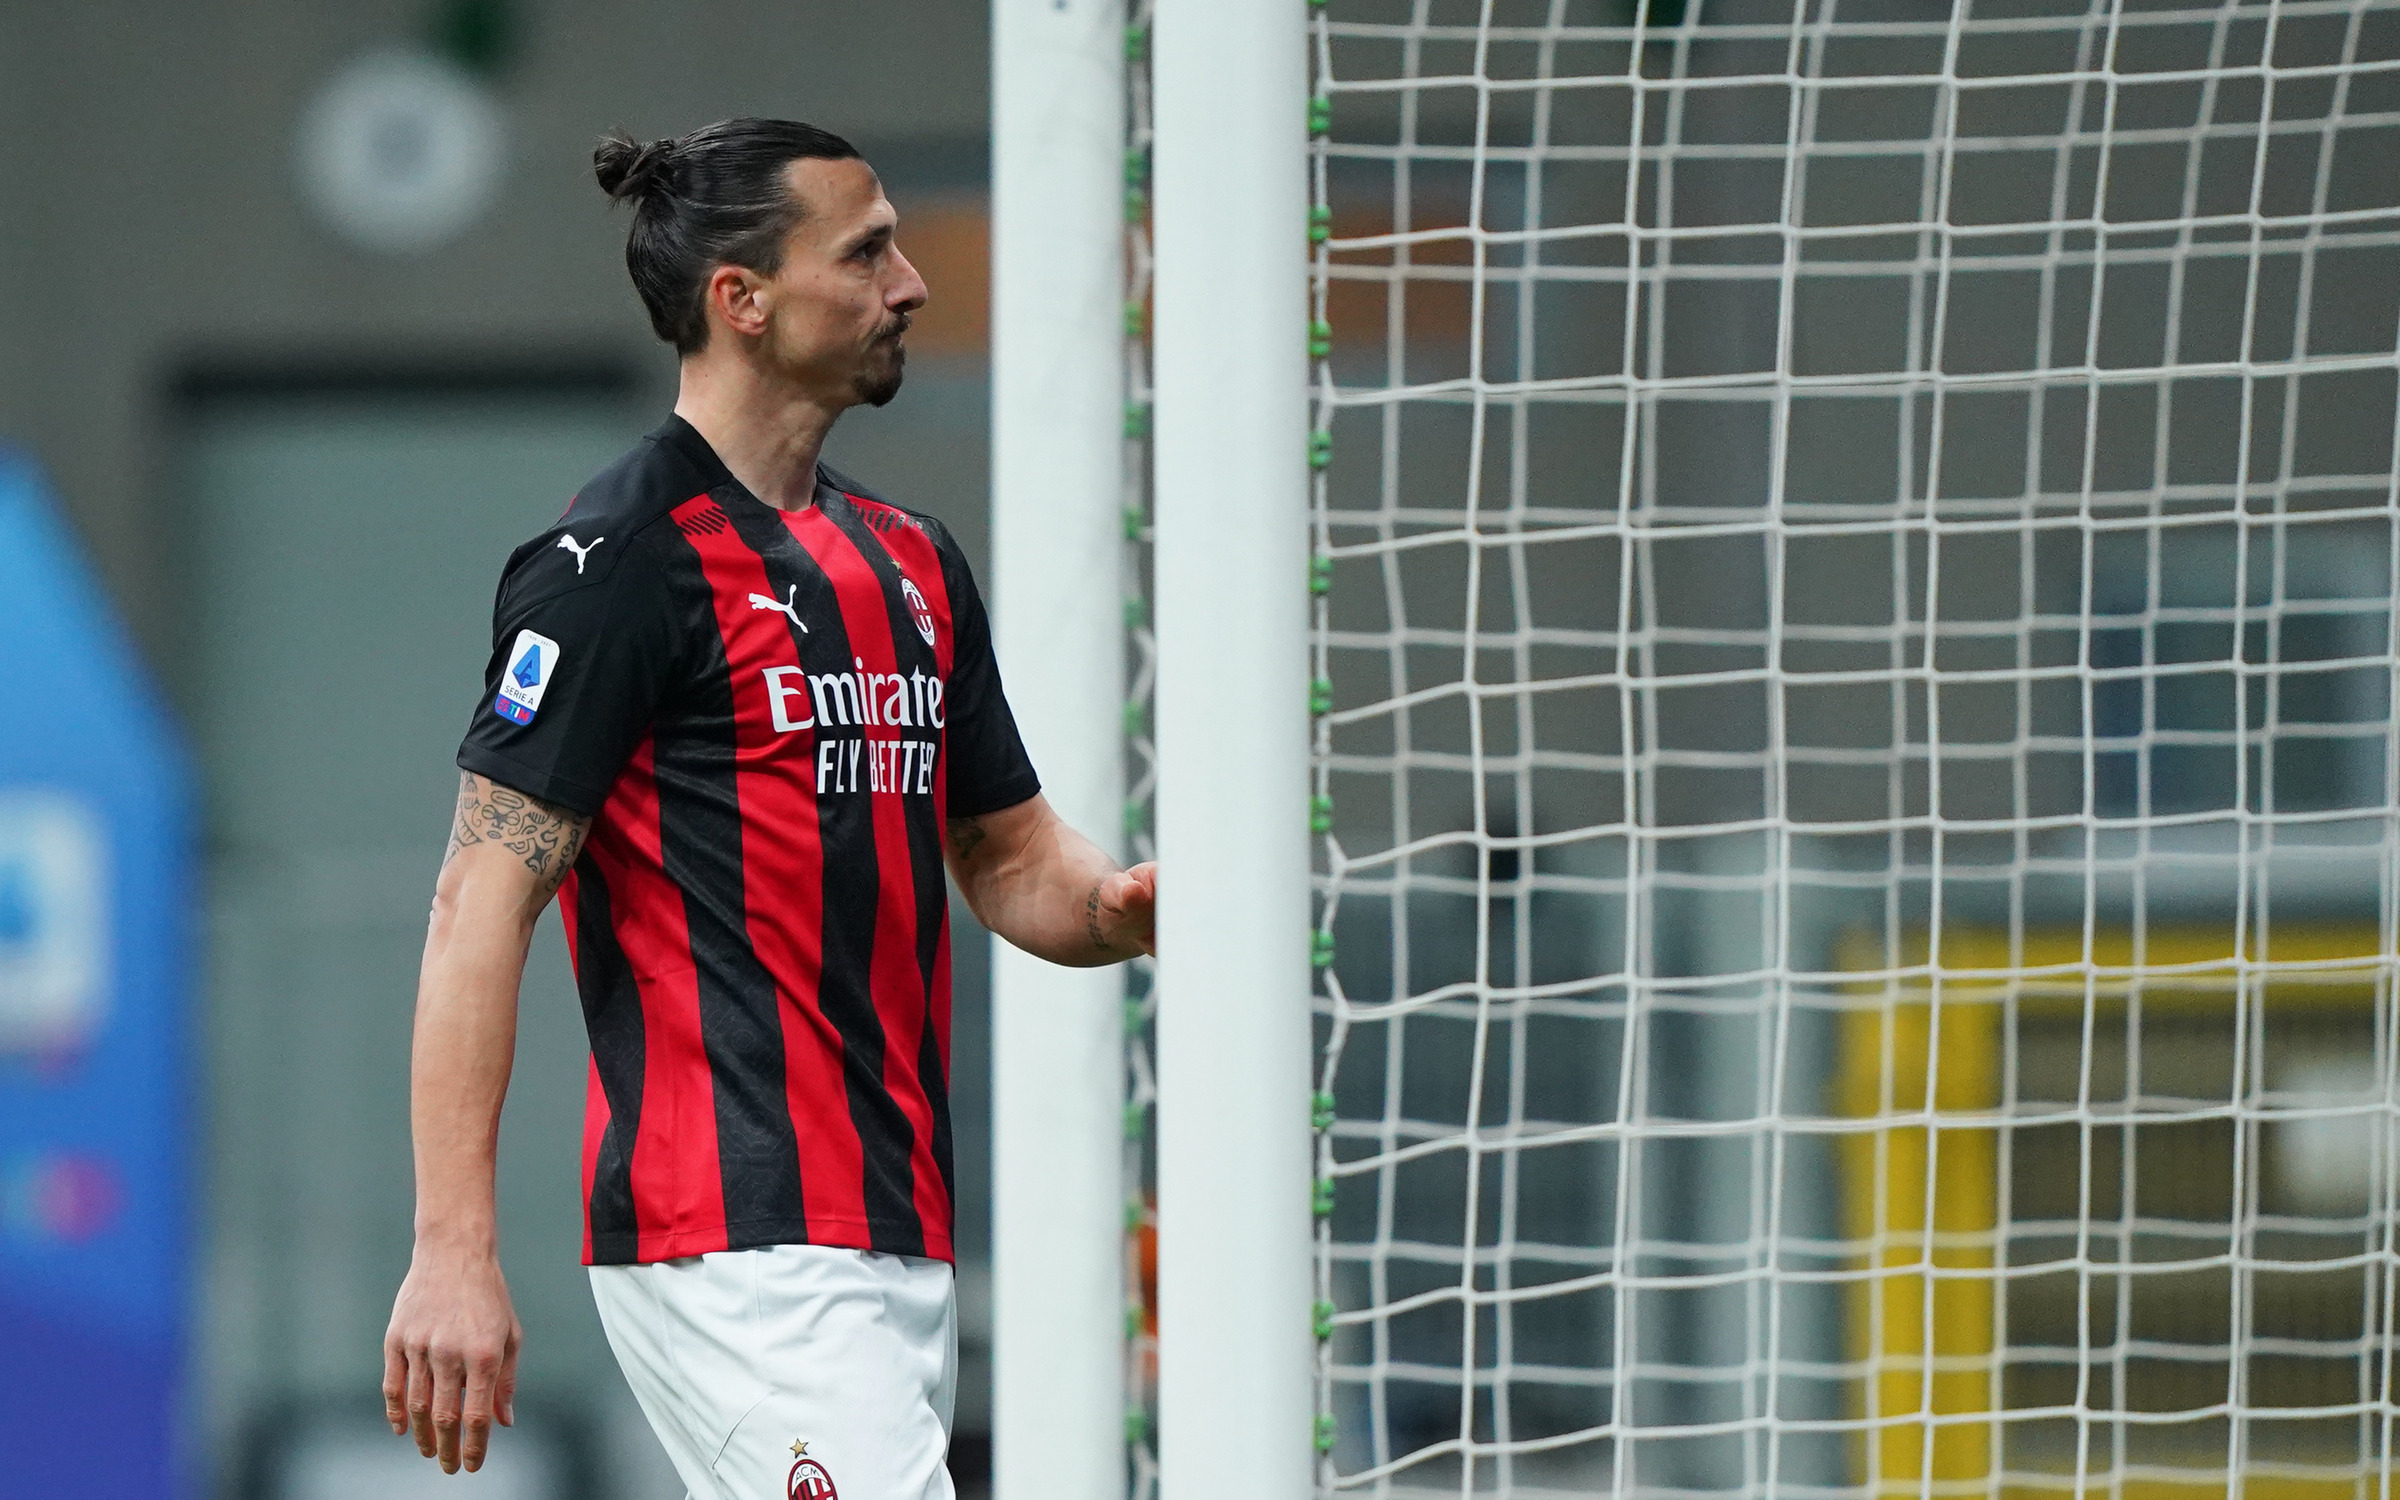 Zlatan Ibrahimovic - Milan vs Atalanta